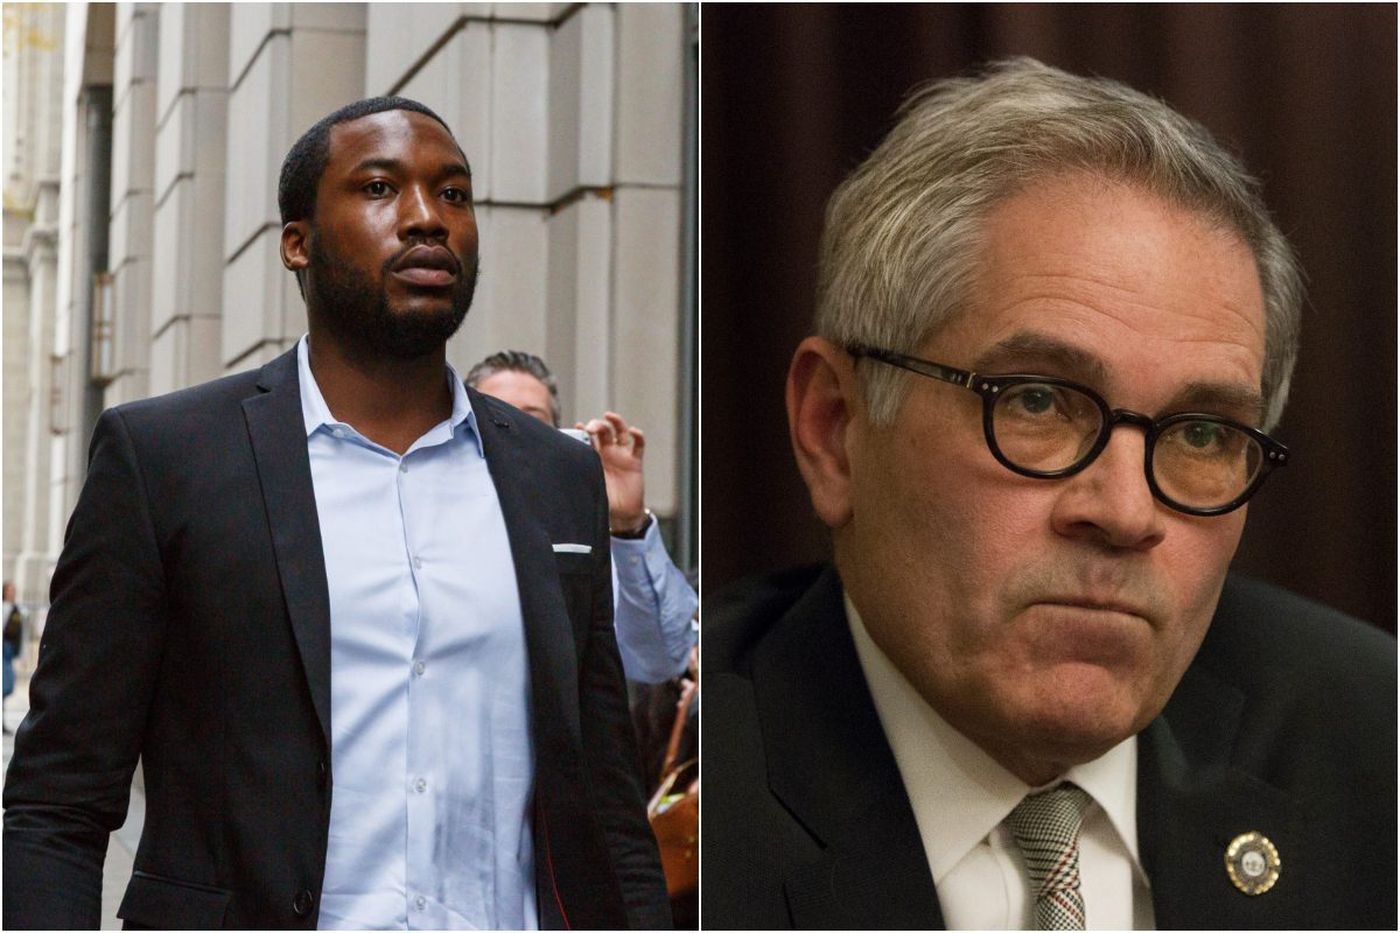 Philly DA Larry Krasner won't oppose Meek Mill's release from prison